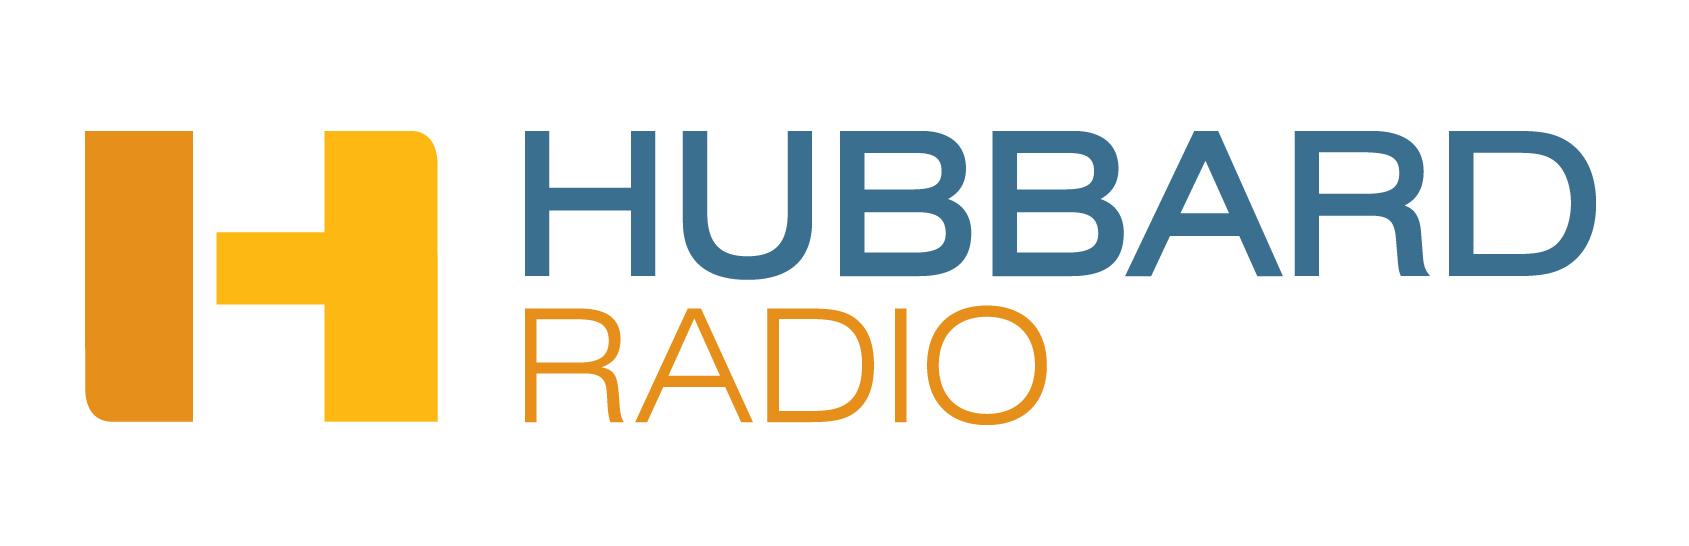 Hubbard Broadcasting